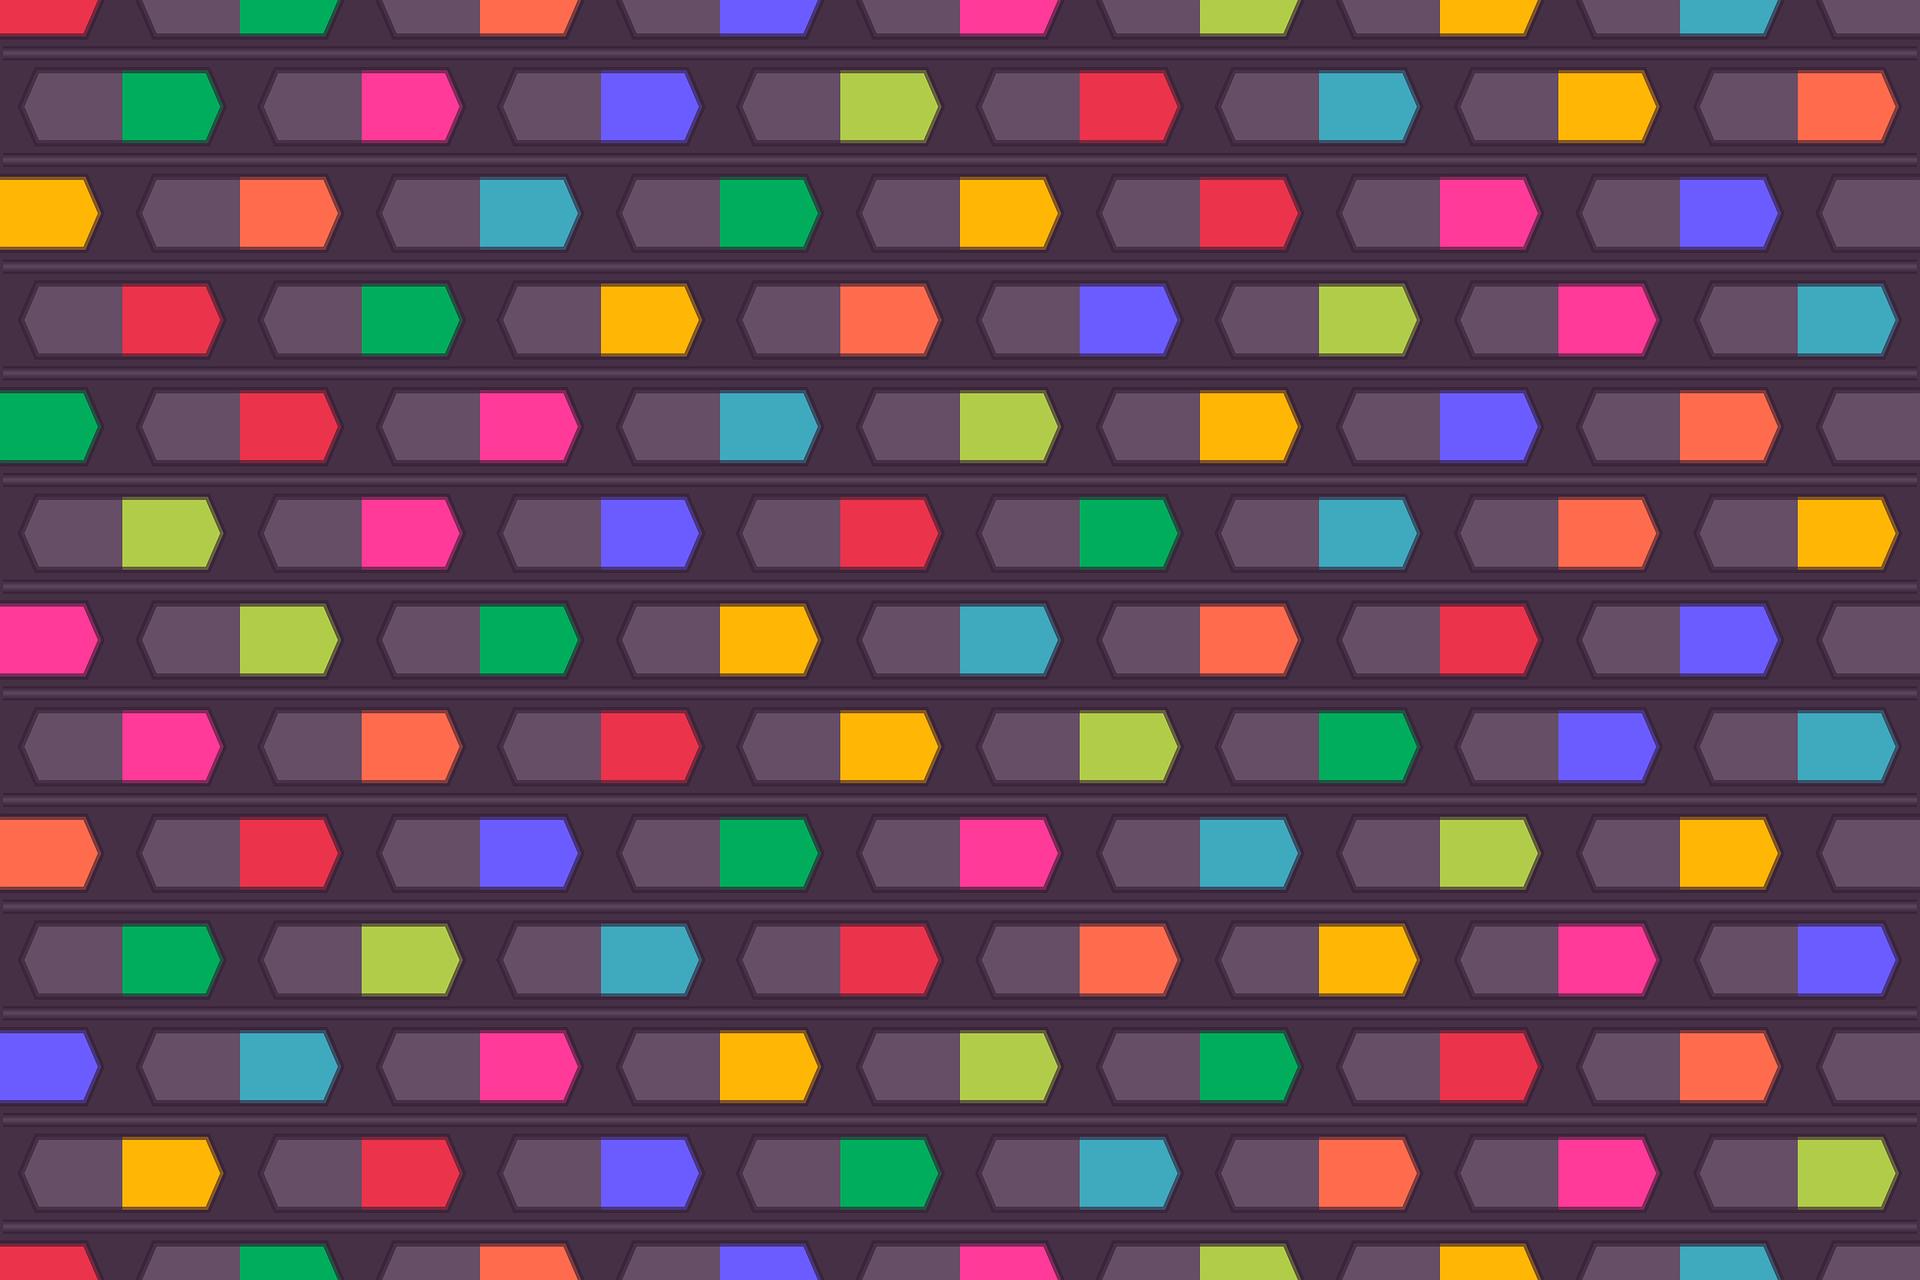 ज्यामिति, रंग, ज्यामितीय, ब्लू, पीला - HD वॉलपेपर - प्रोफेसर-falken.com